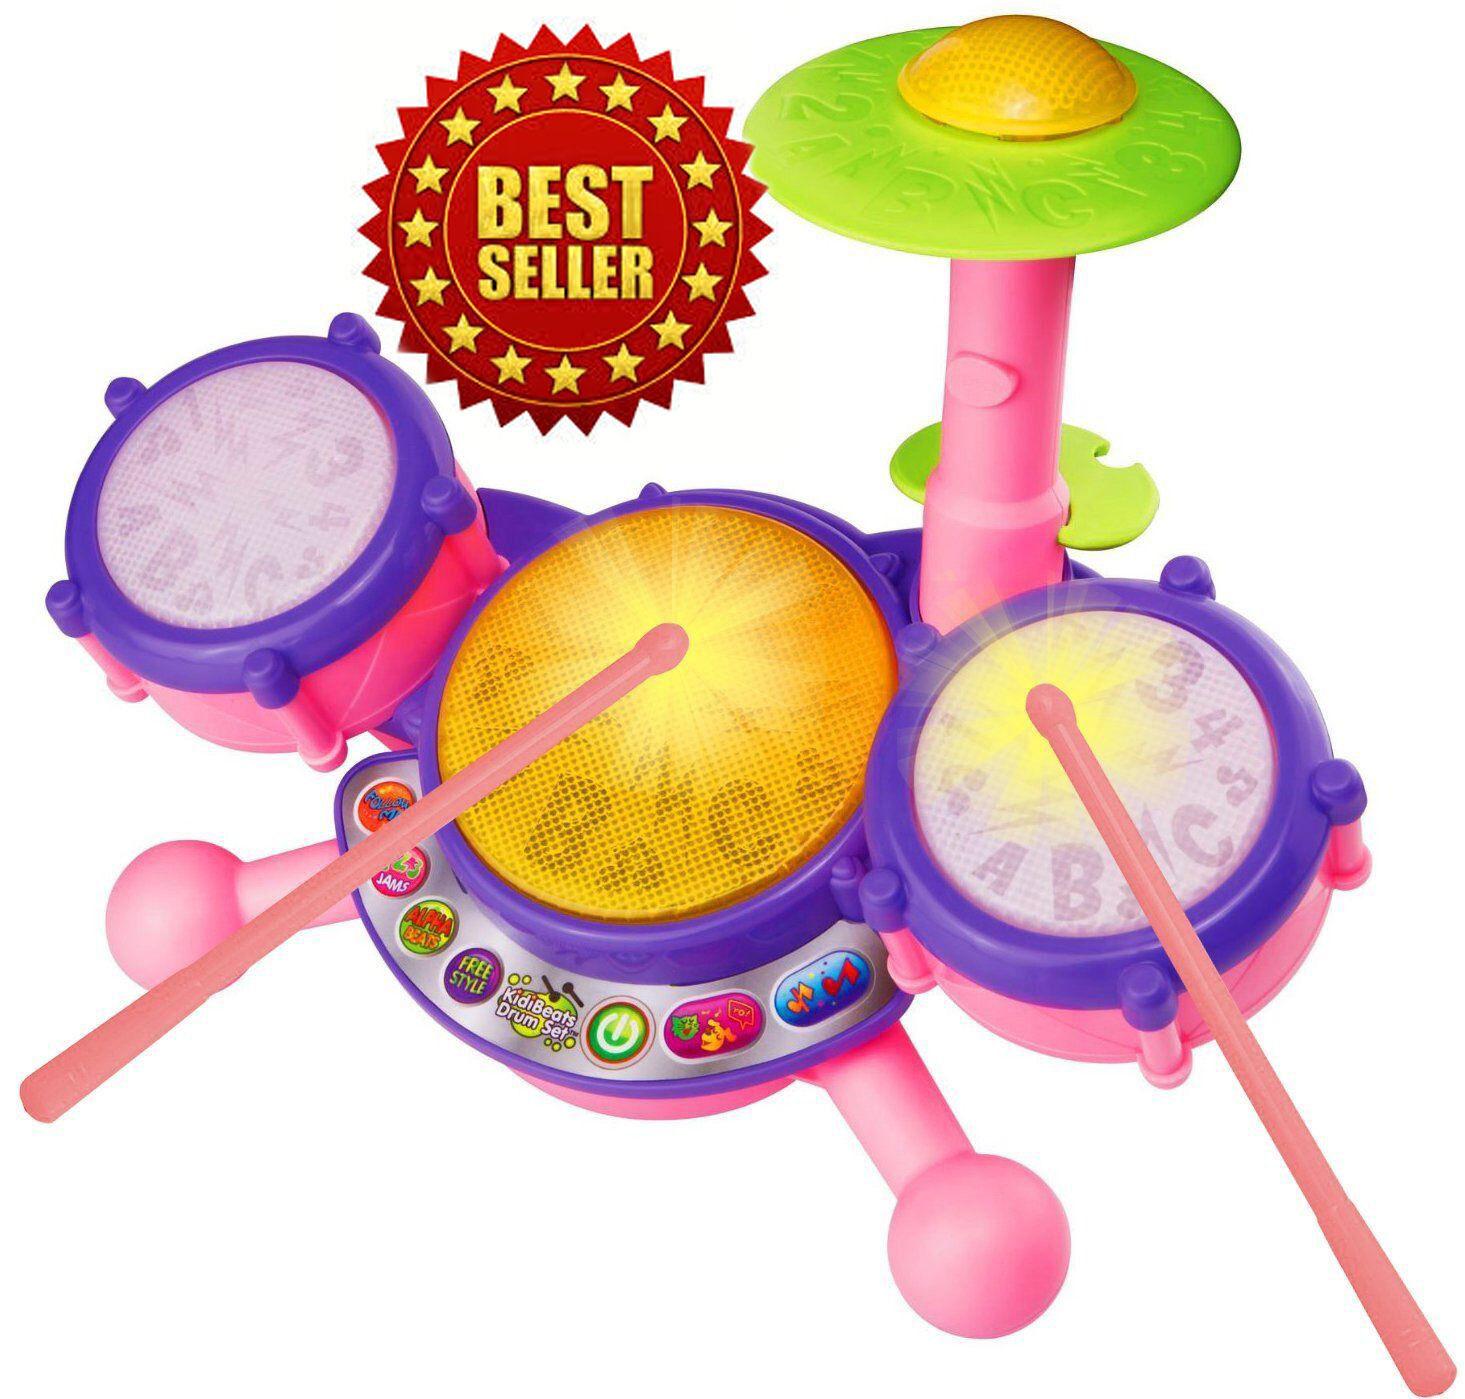 Vtech Kidibeats Pink Exclusive Drum Set Kids Music Girl